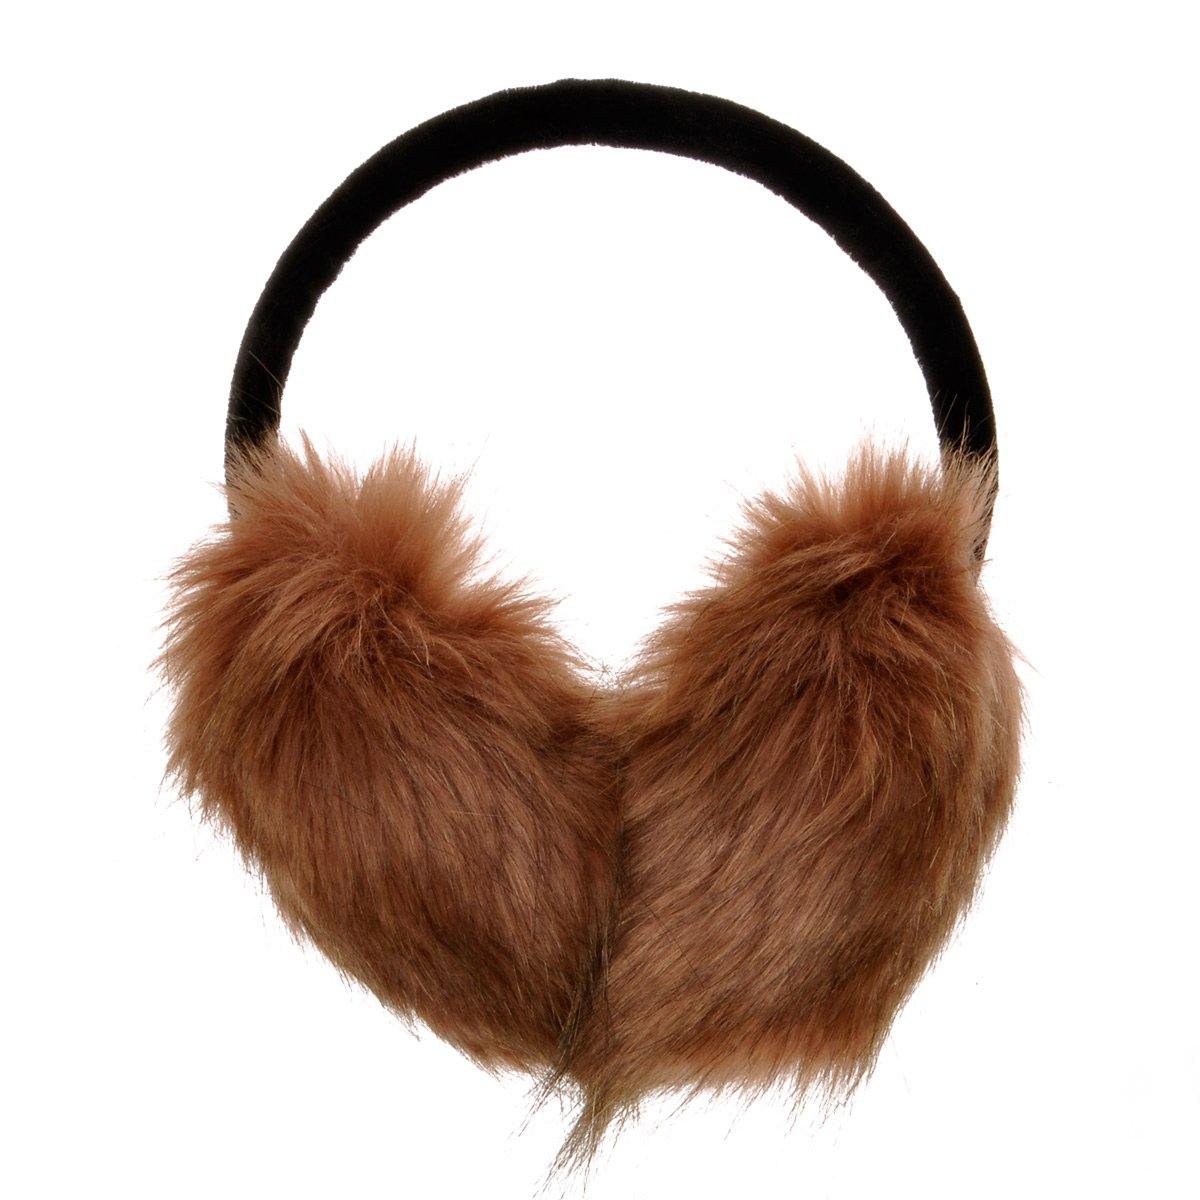 ZLYC Womens Girls Winter Fashion Adjustable Faux Fur EarMuffs Ear Warmers (Black) ZYJ-ET-007-BK-1